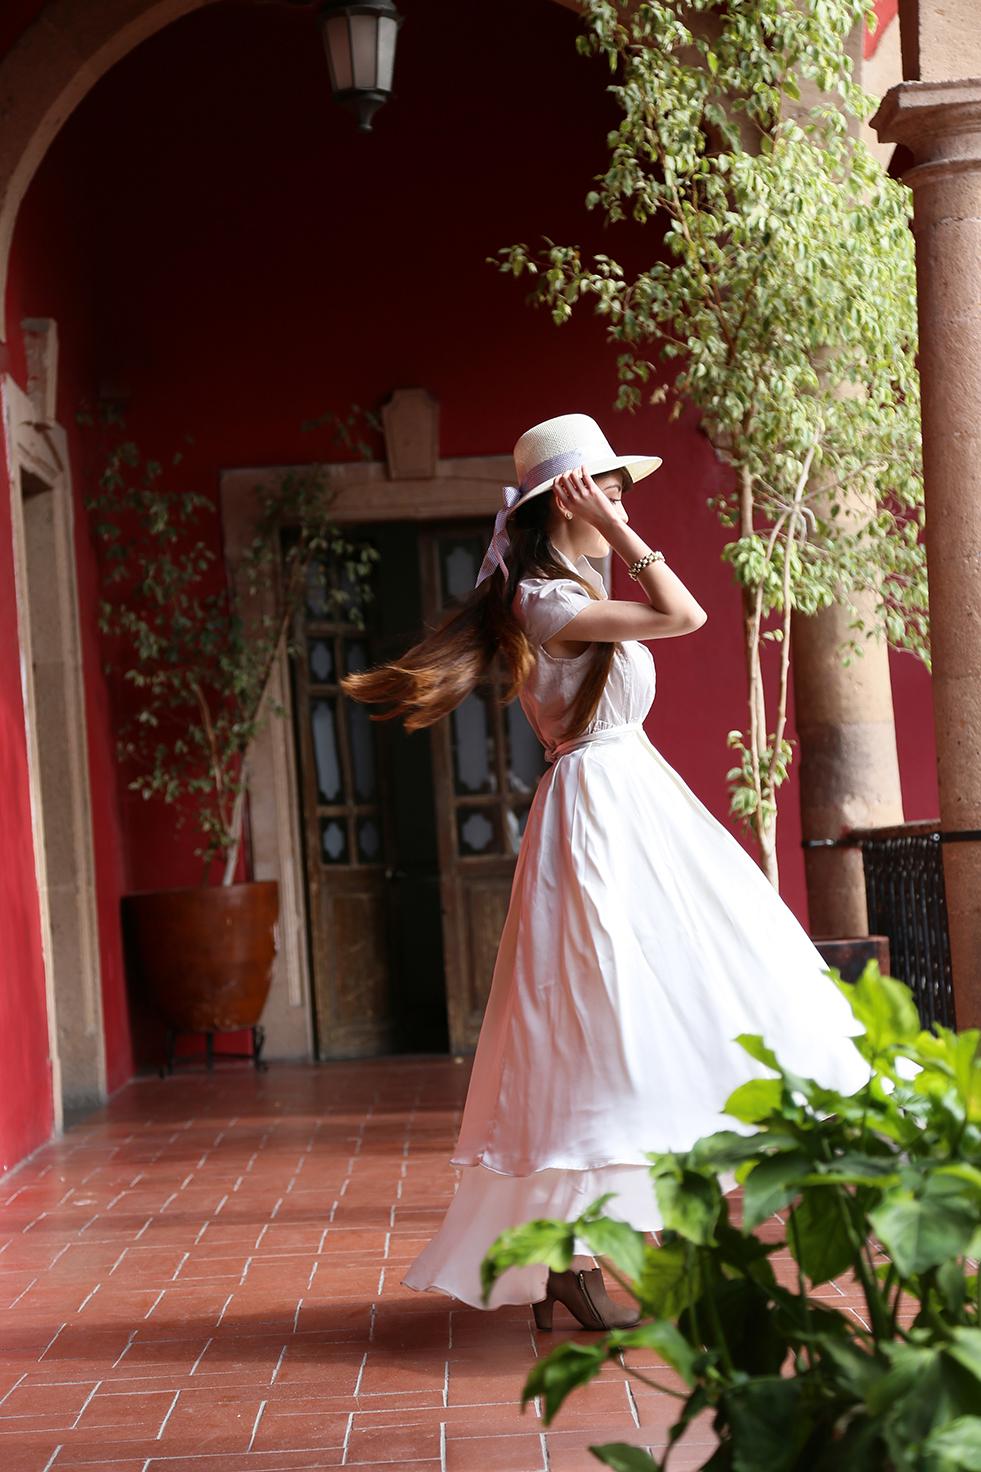 Maroge-Angela-Velazquez-fotografia-sesiones-diseño-20